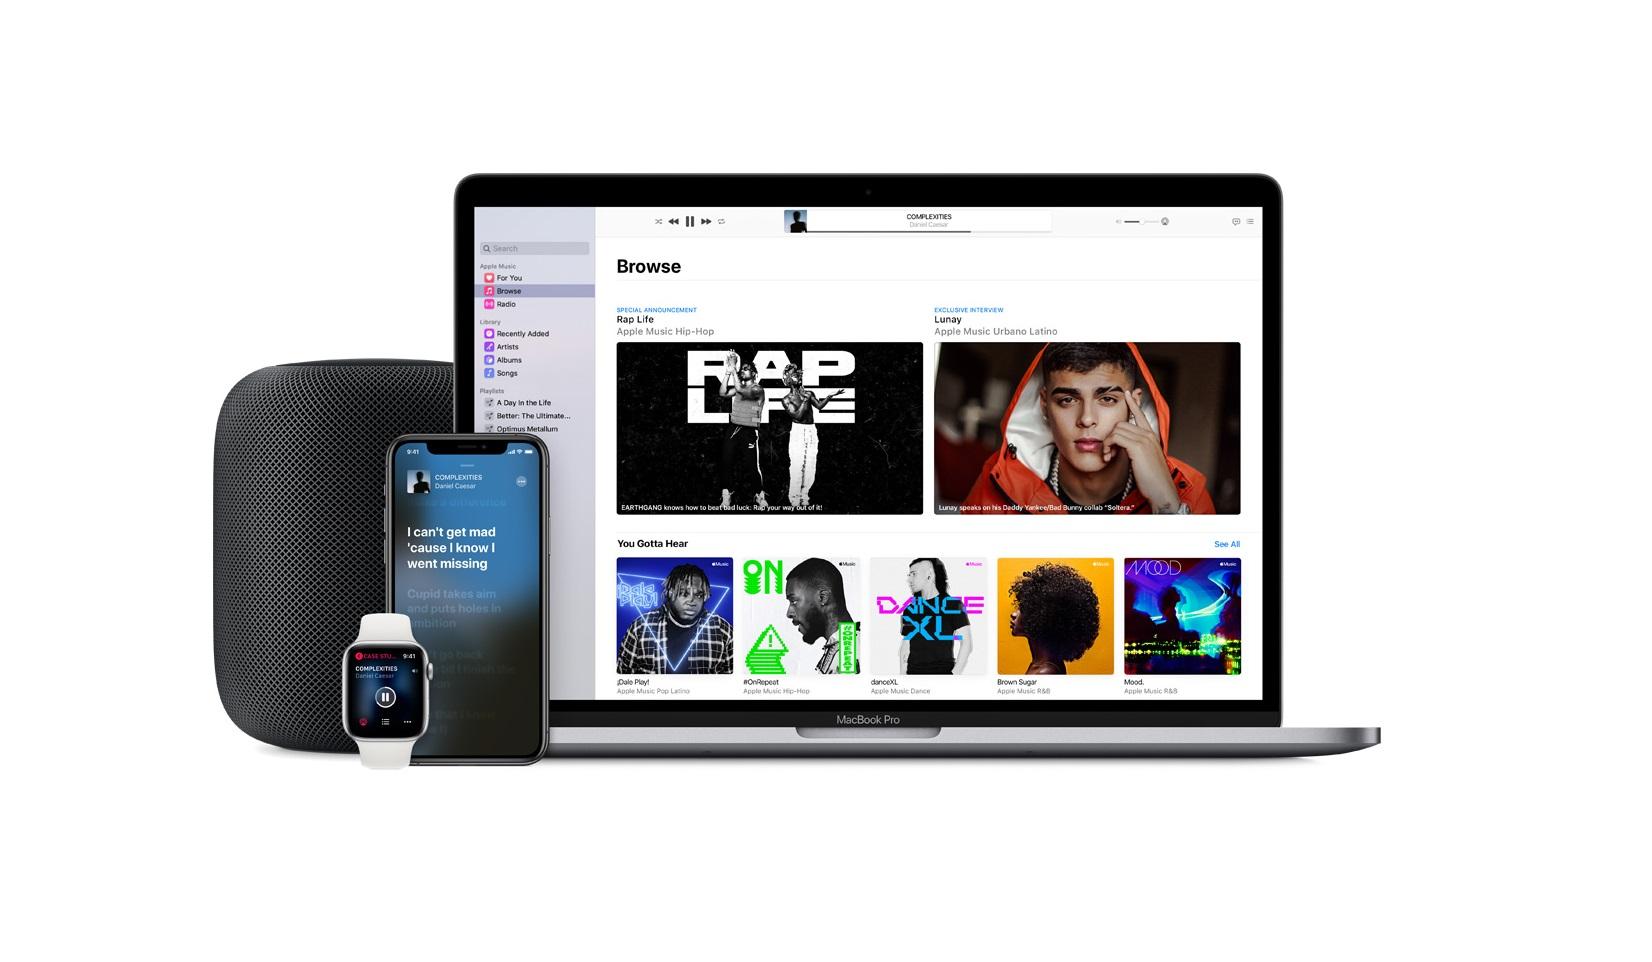 苹果或将 Apple TV+ 和 Apple Music 服务打包出售